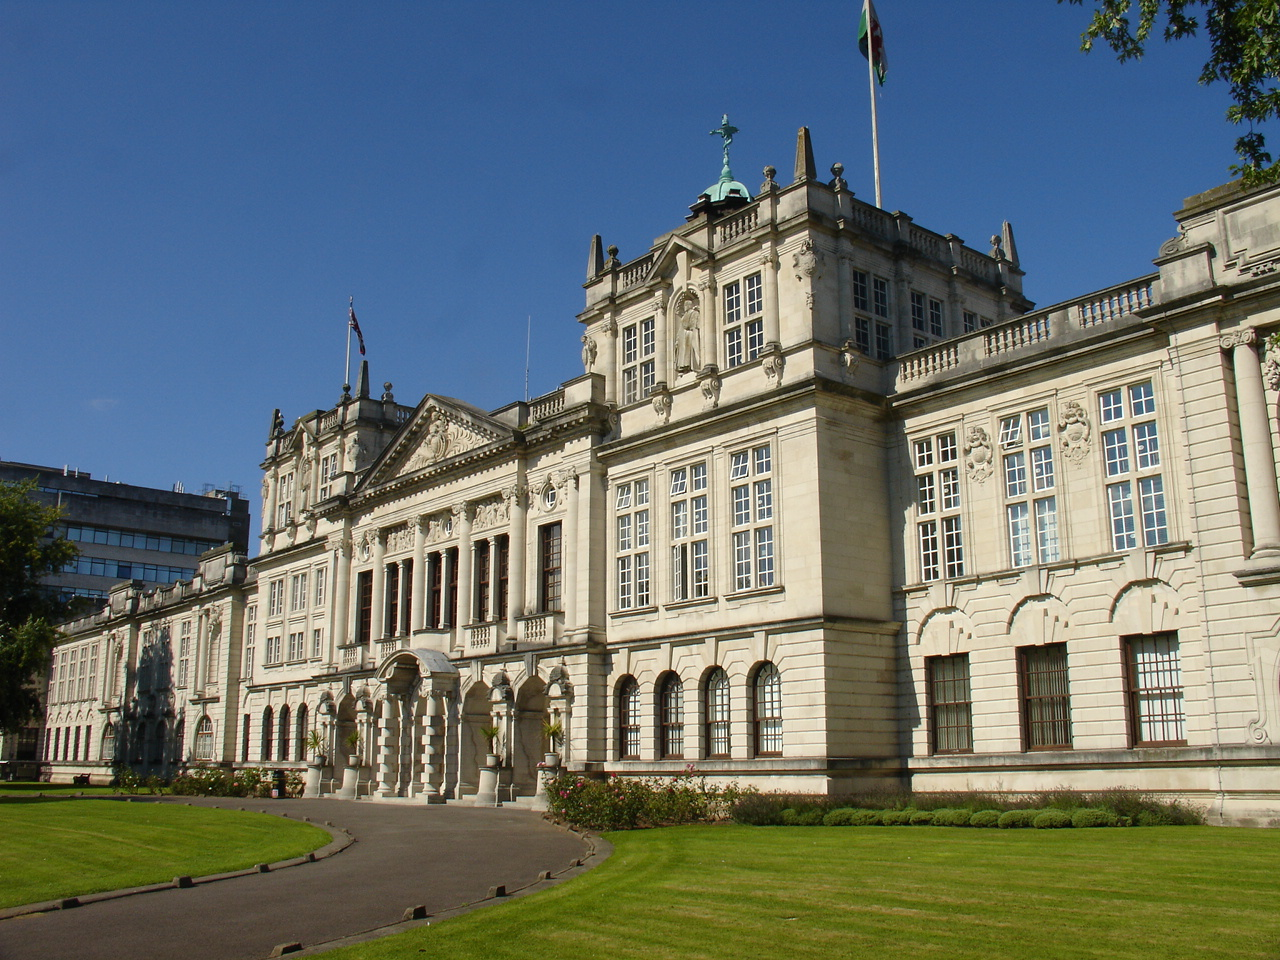 Cardiff_University_main_building.jpg